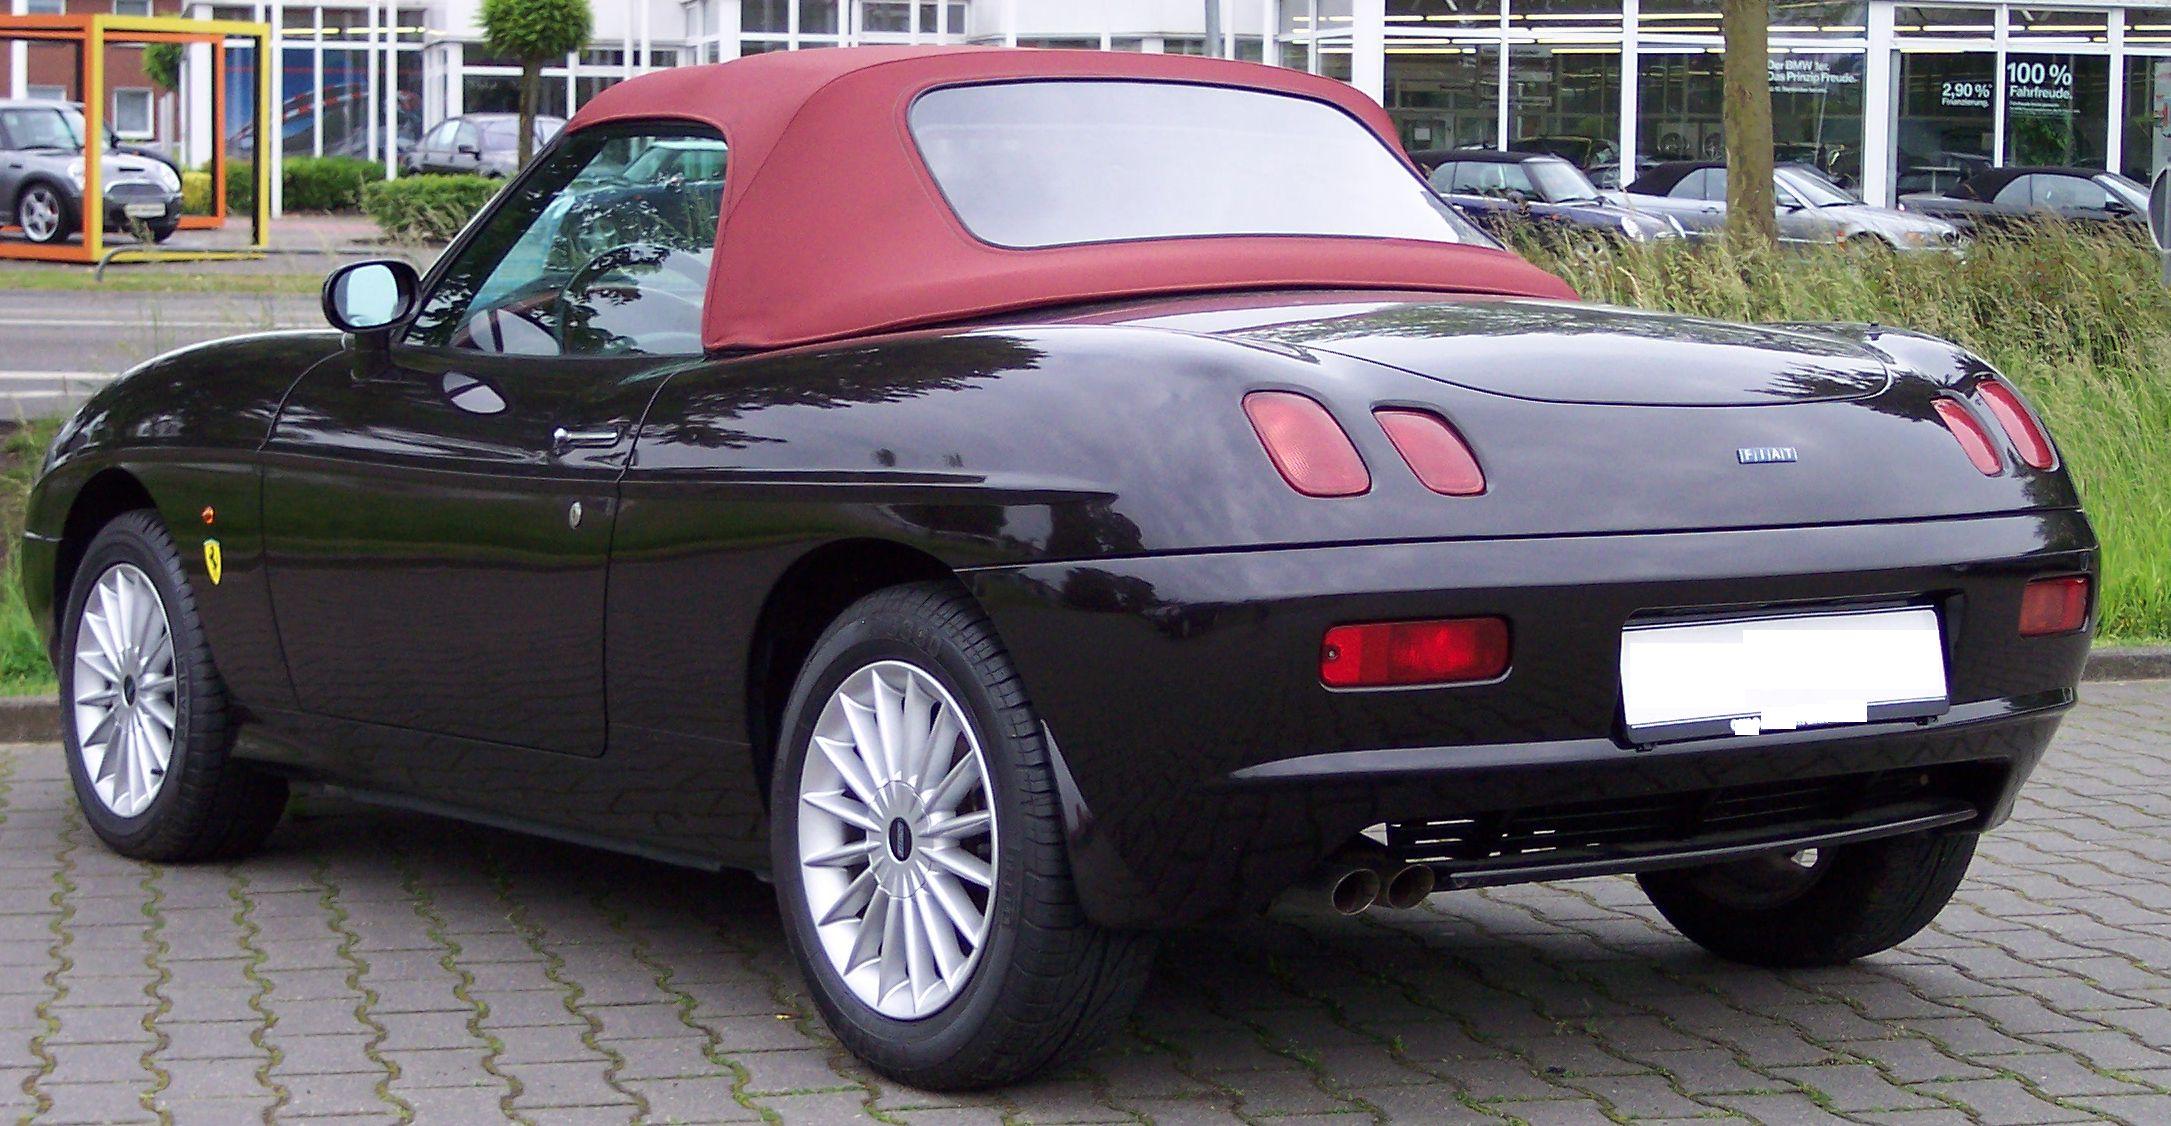 Fiat Barchetta I Restyling 2003 - 2005 Cabriolet #3